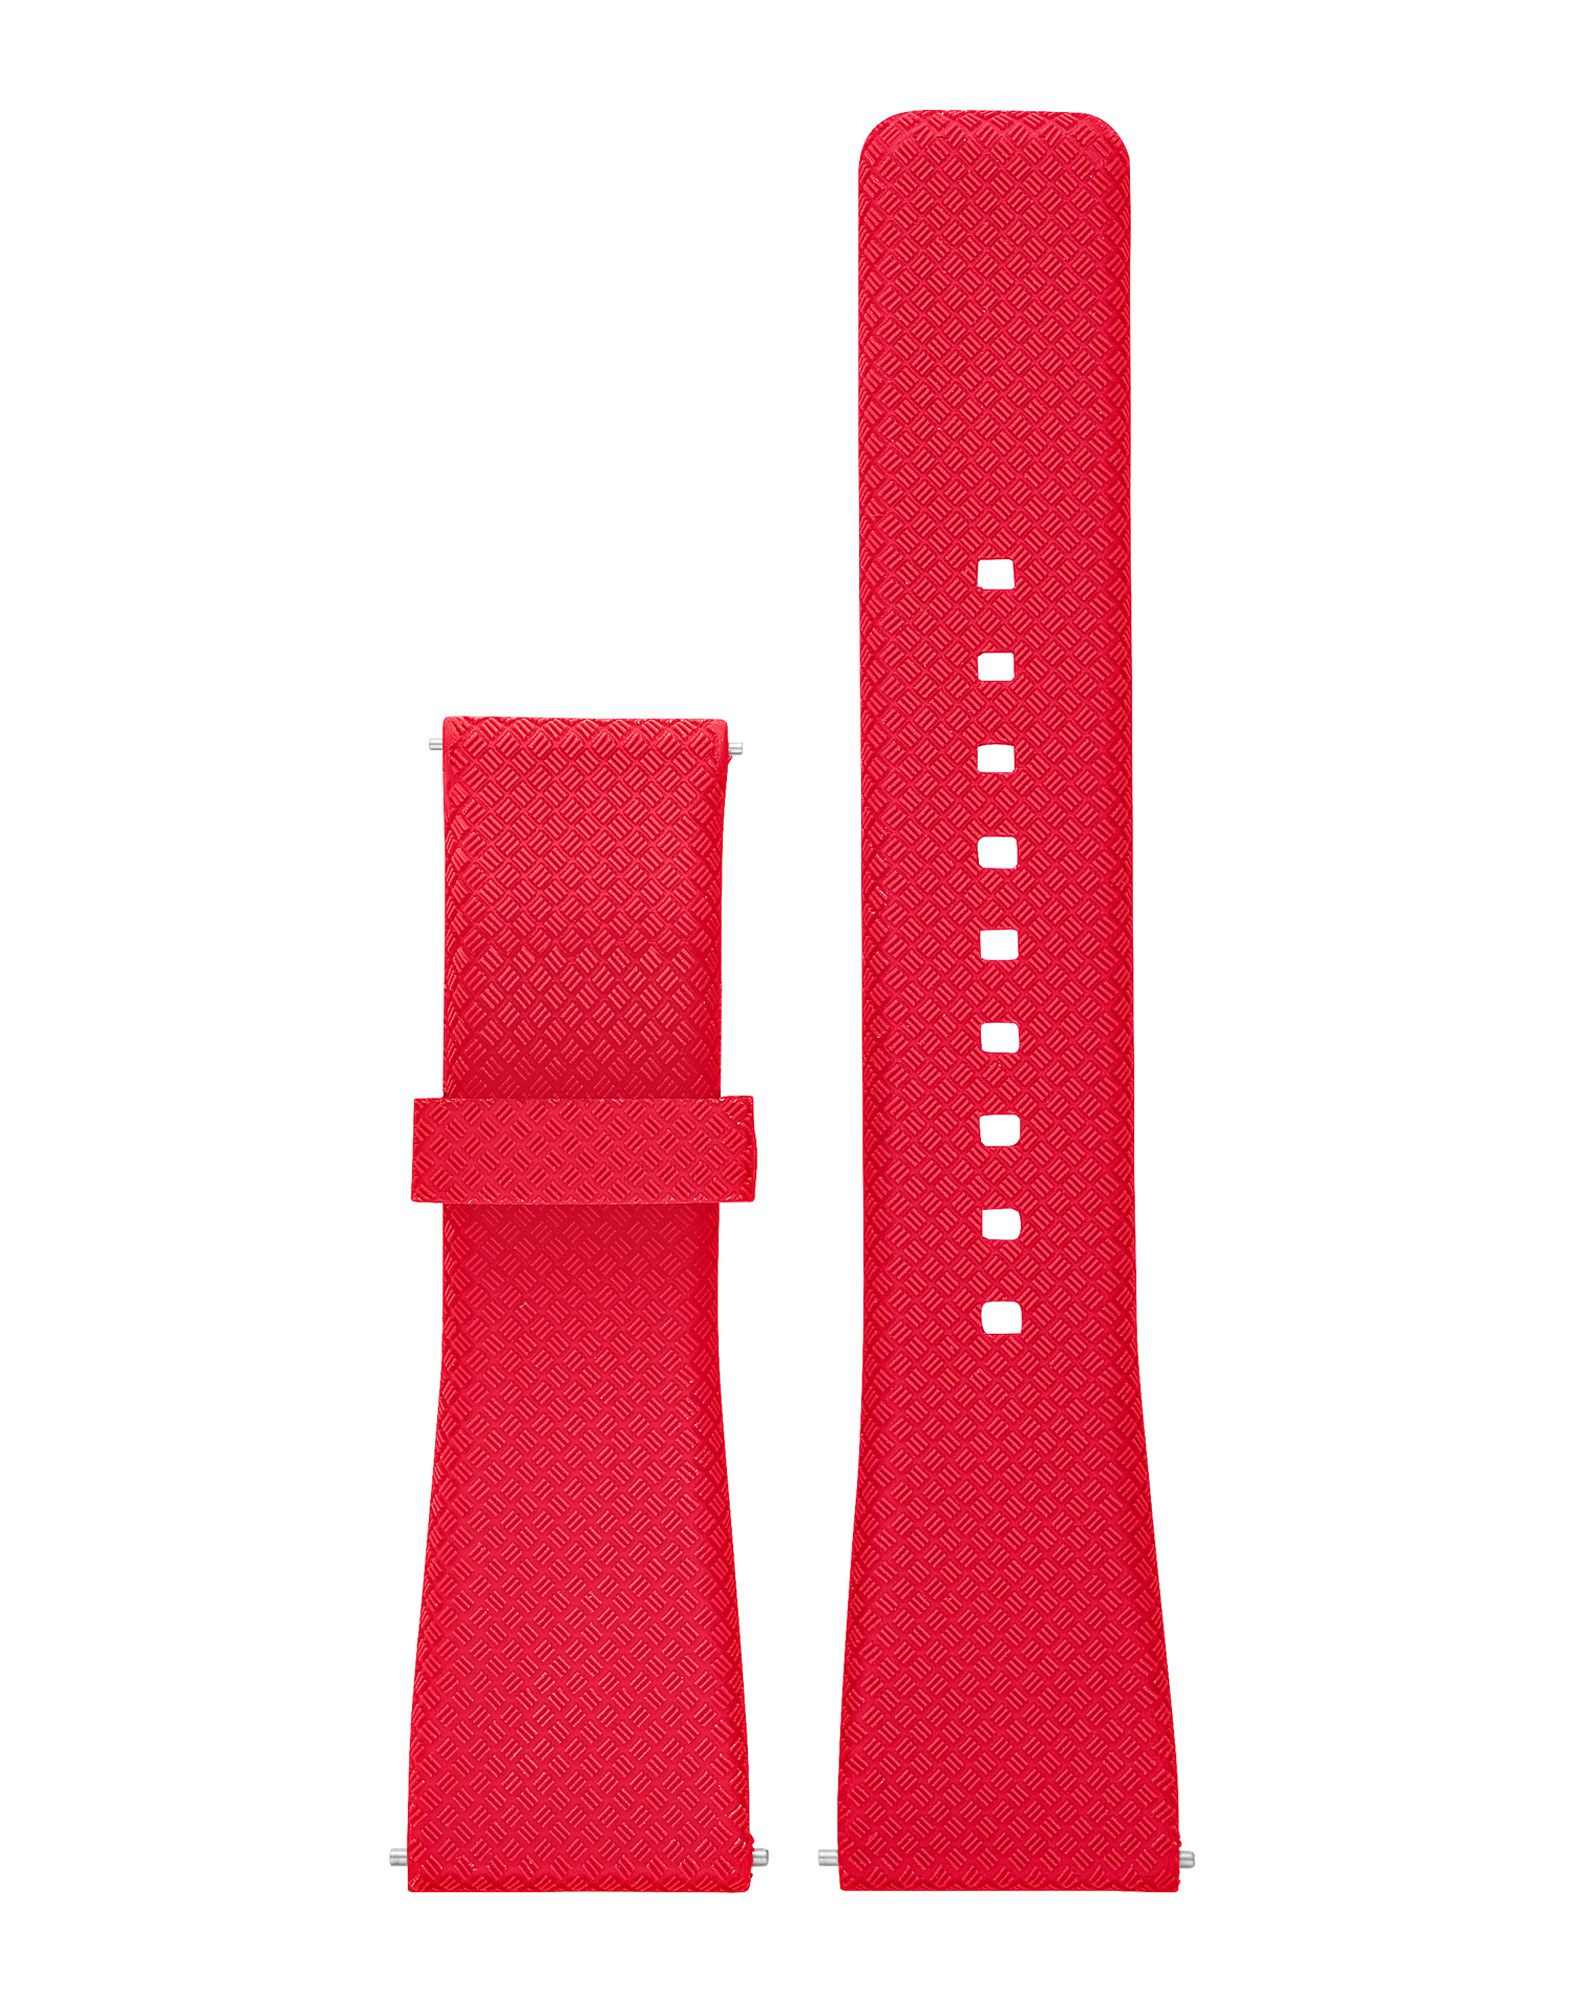 Michael Kors Access Watch Accessories